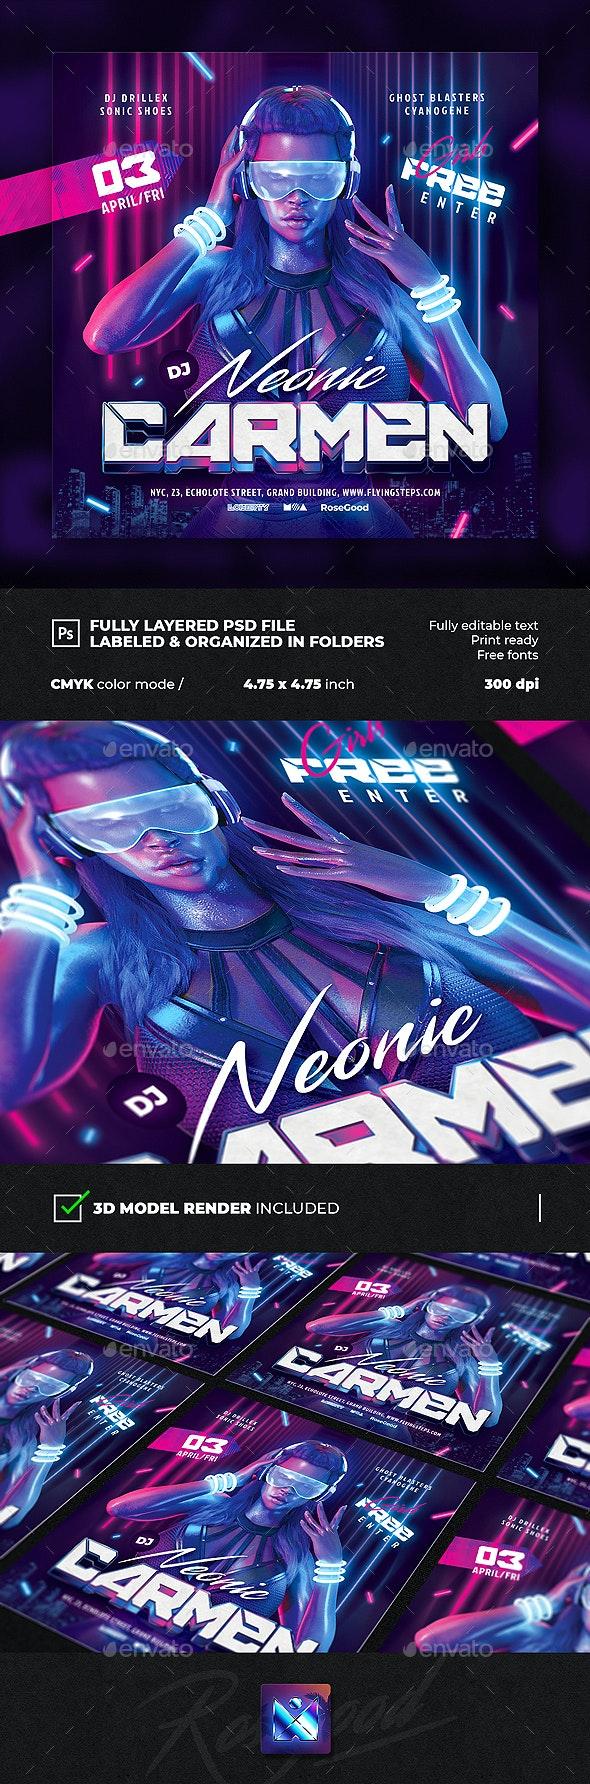 Party Flyer DJ Neonic Carmen - Clubs & Parties Events